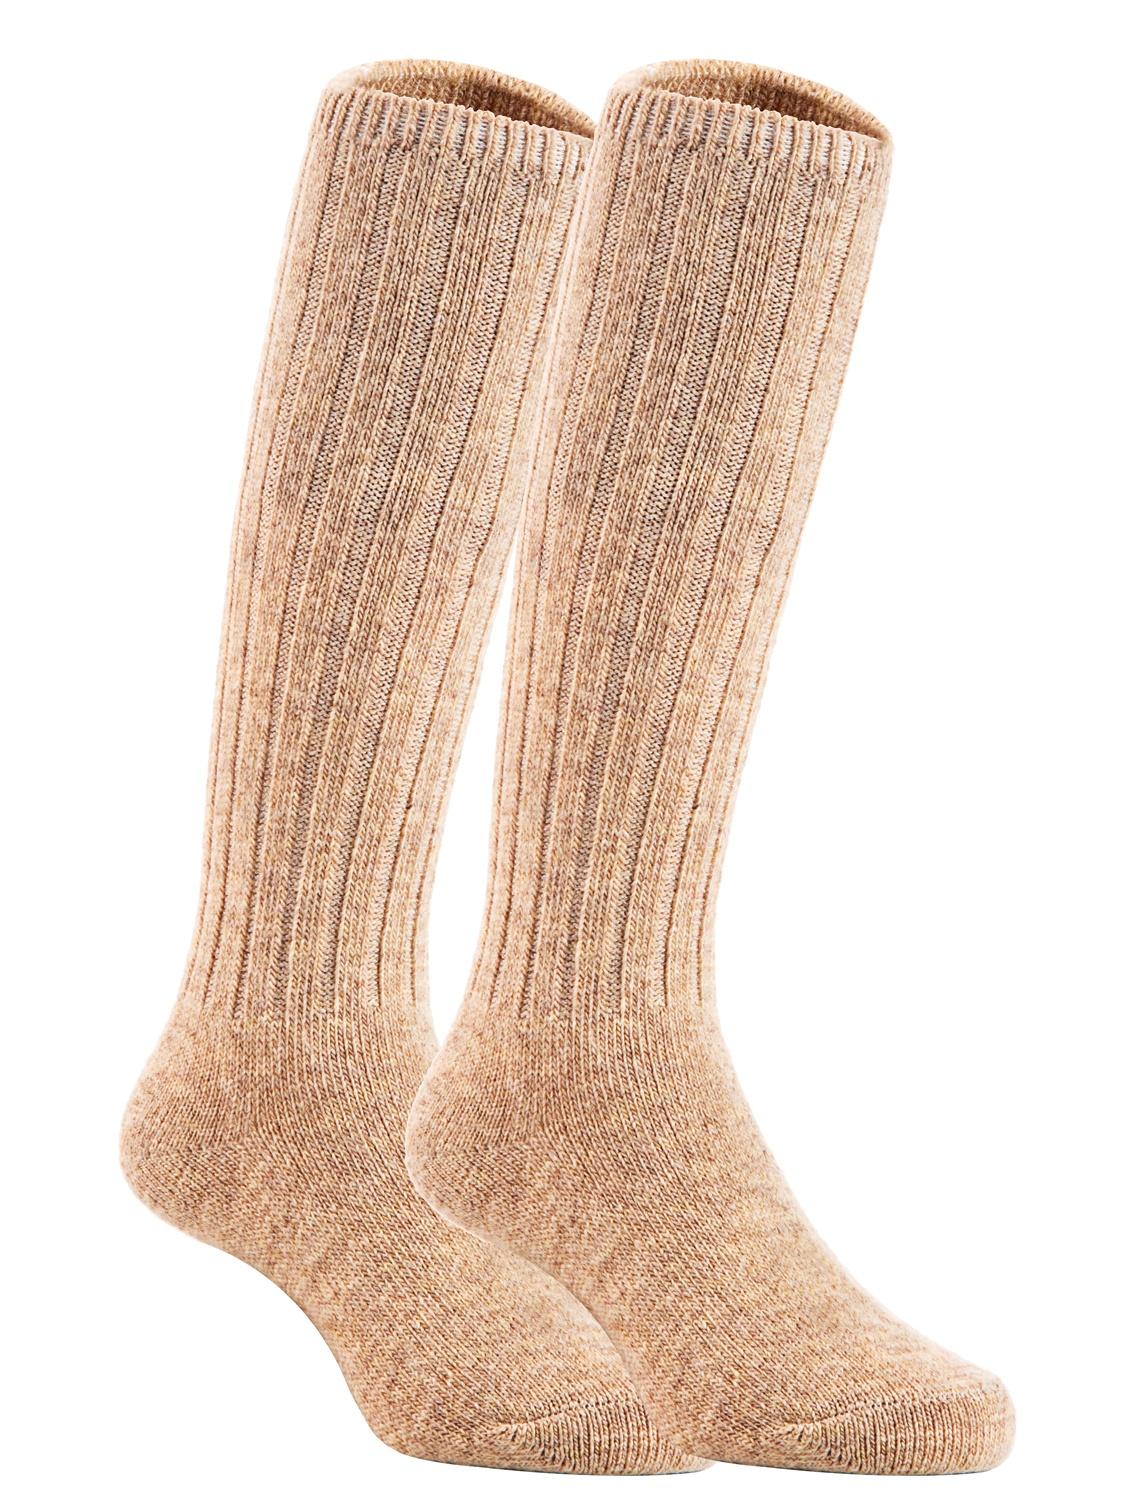 Lian LifeStyle Unisex Baby Children 3 Pairs Knee High Wool Blend Boot Socks Size 0-2Y  (Beige)